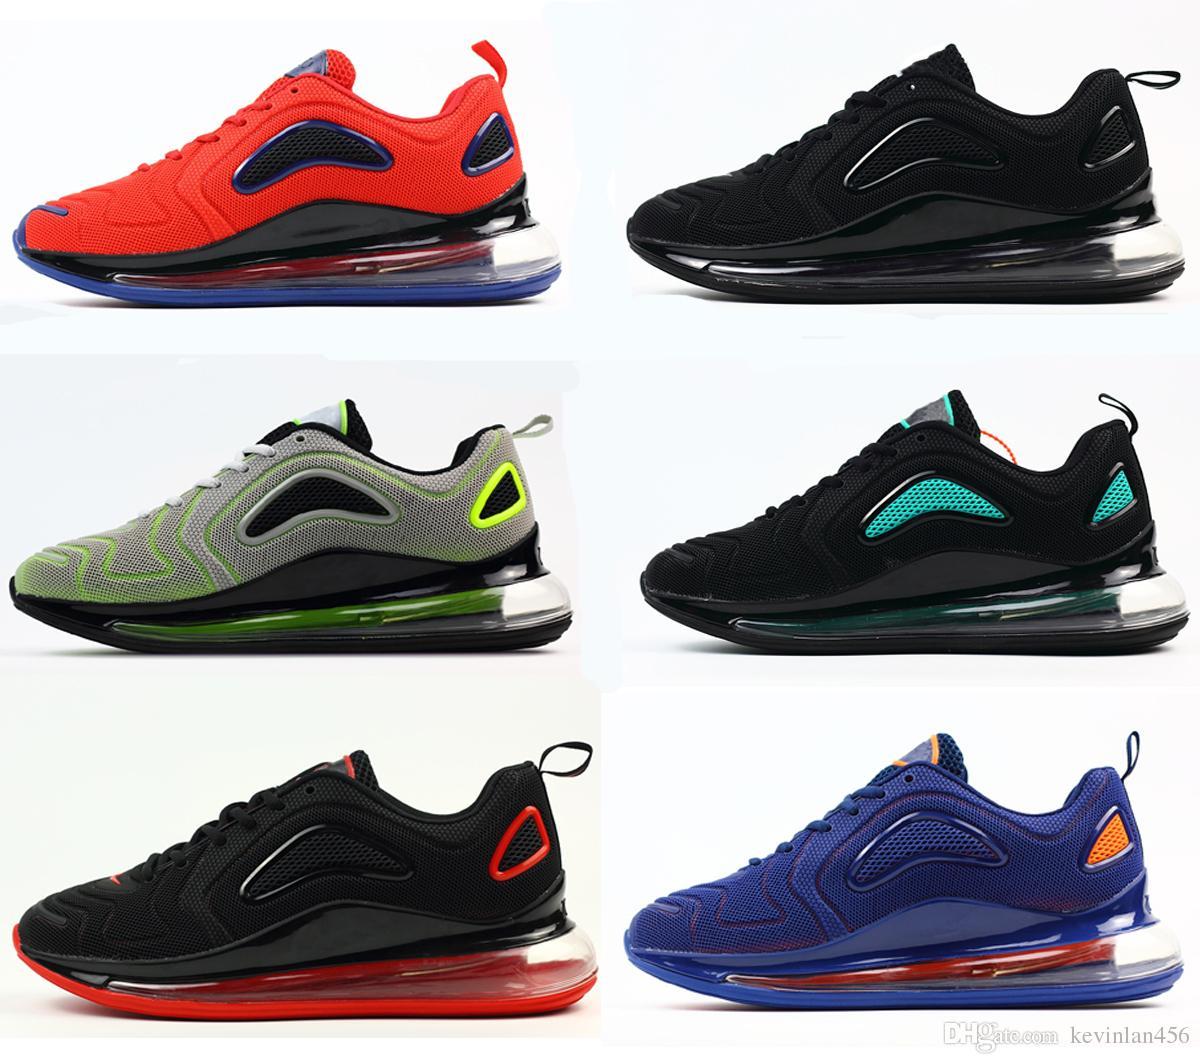 4d464e49f65 New Style Designer Shoes Mens Shoes Wholesale High Quality Vol.720 ...